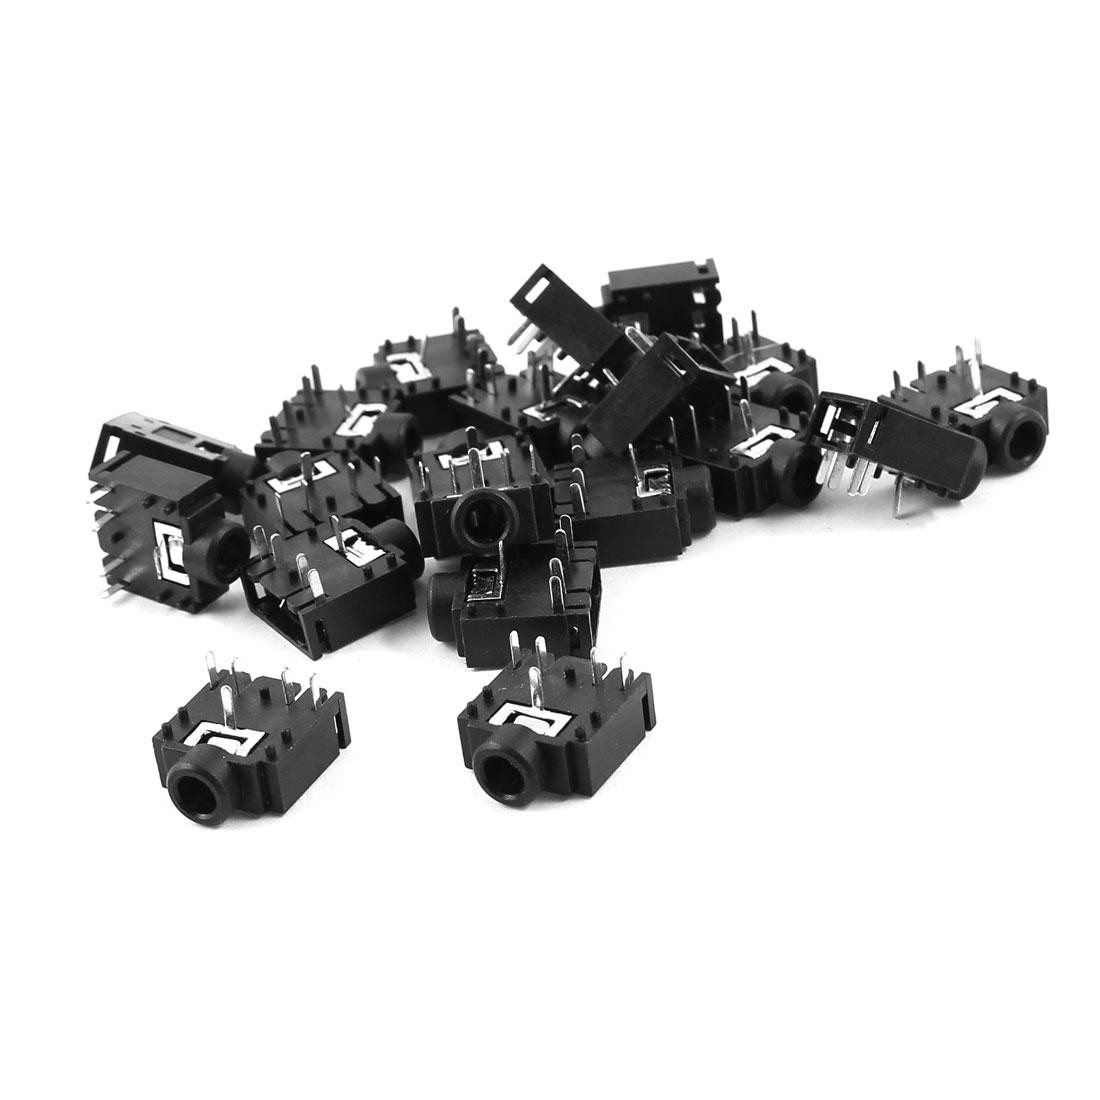 20 Pcs PCB Mount 5 Pin Terminals 3.5mm Female Audio Jack Socket Connector